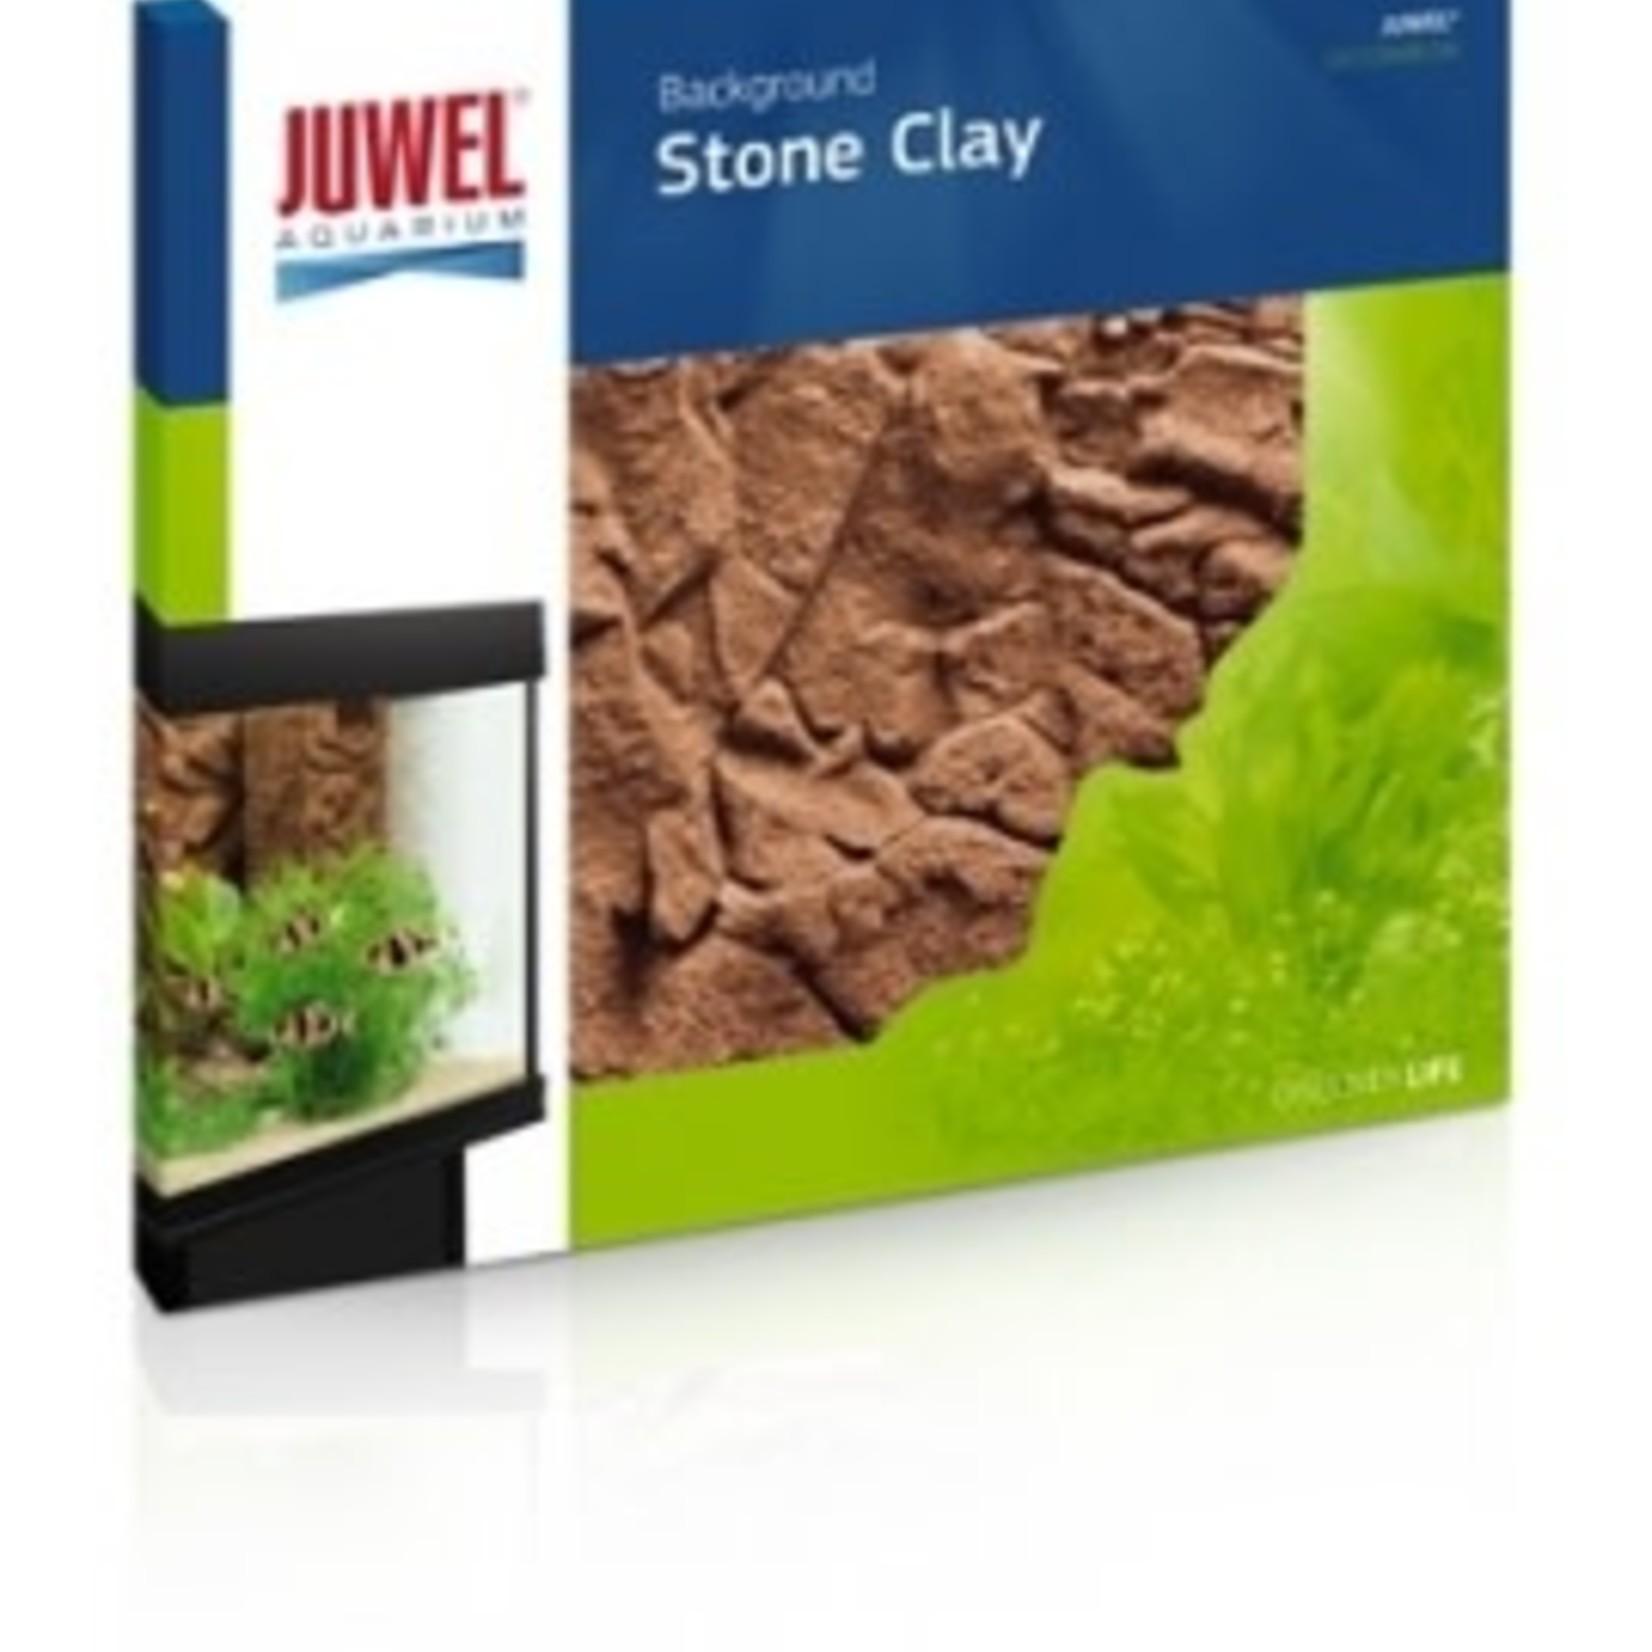 Juwel FOND ARRIERE STONE CLAY (600x550mm)